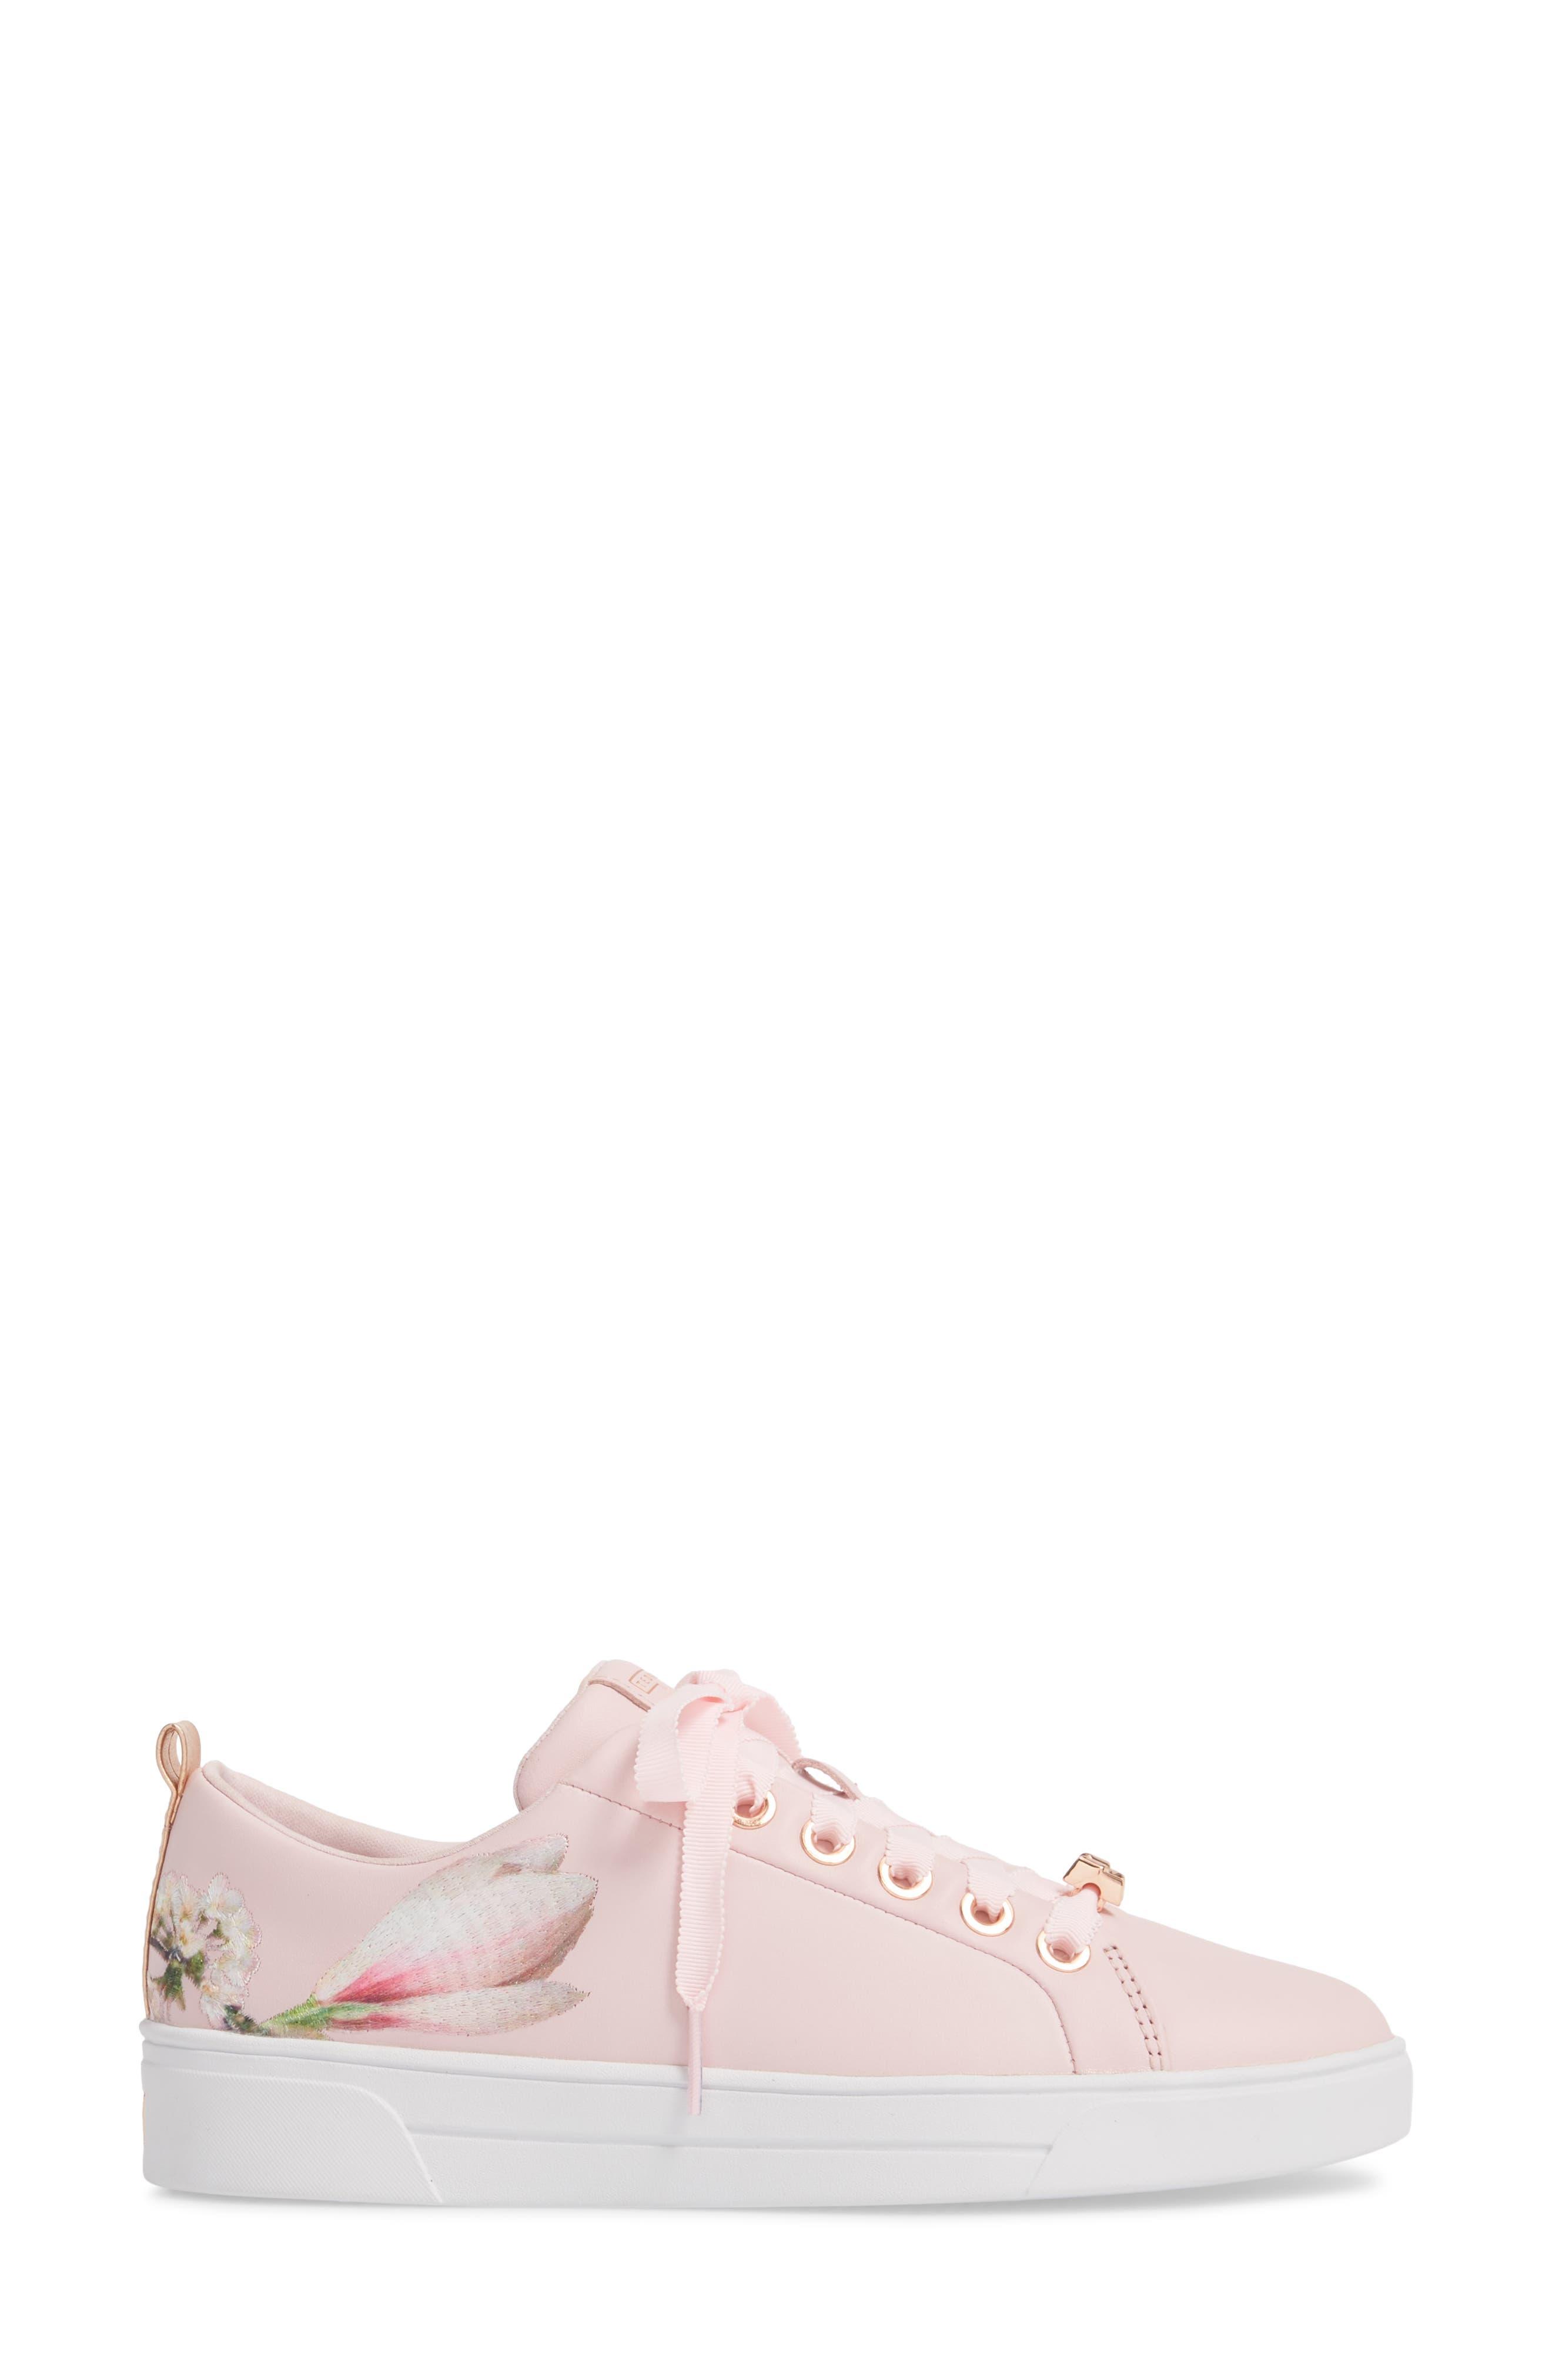 Kelleie Embroidered Sneaker,                             Alternate thumbnail 3, color,                             Mink Pink Leather